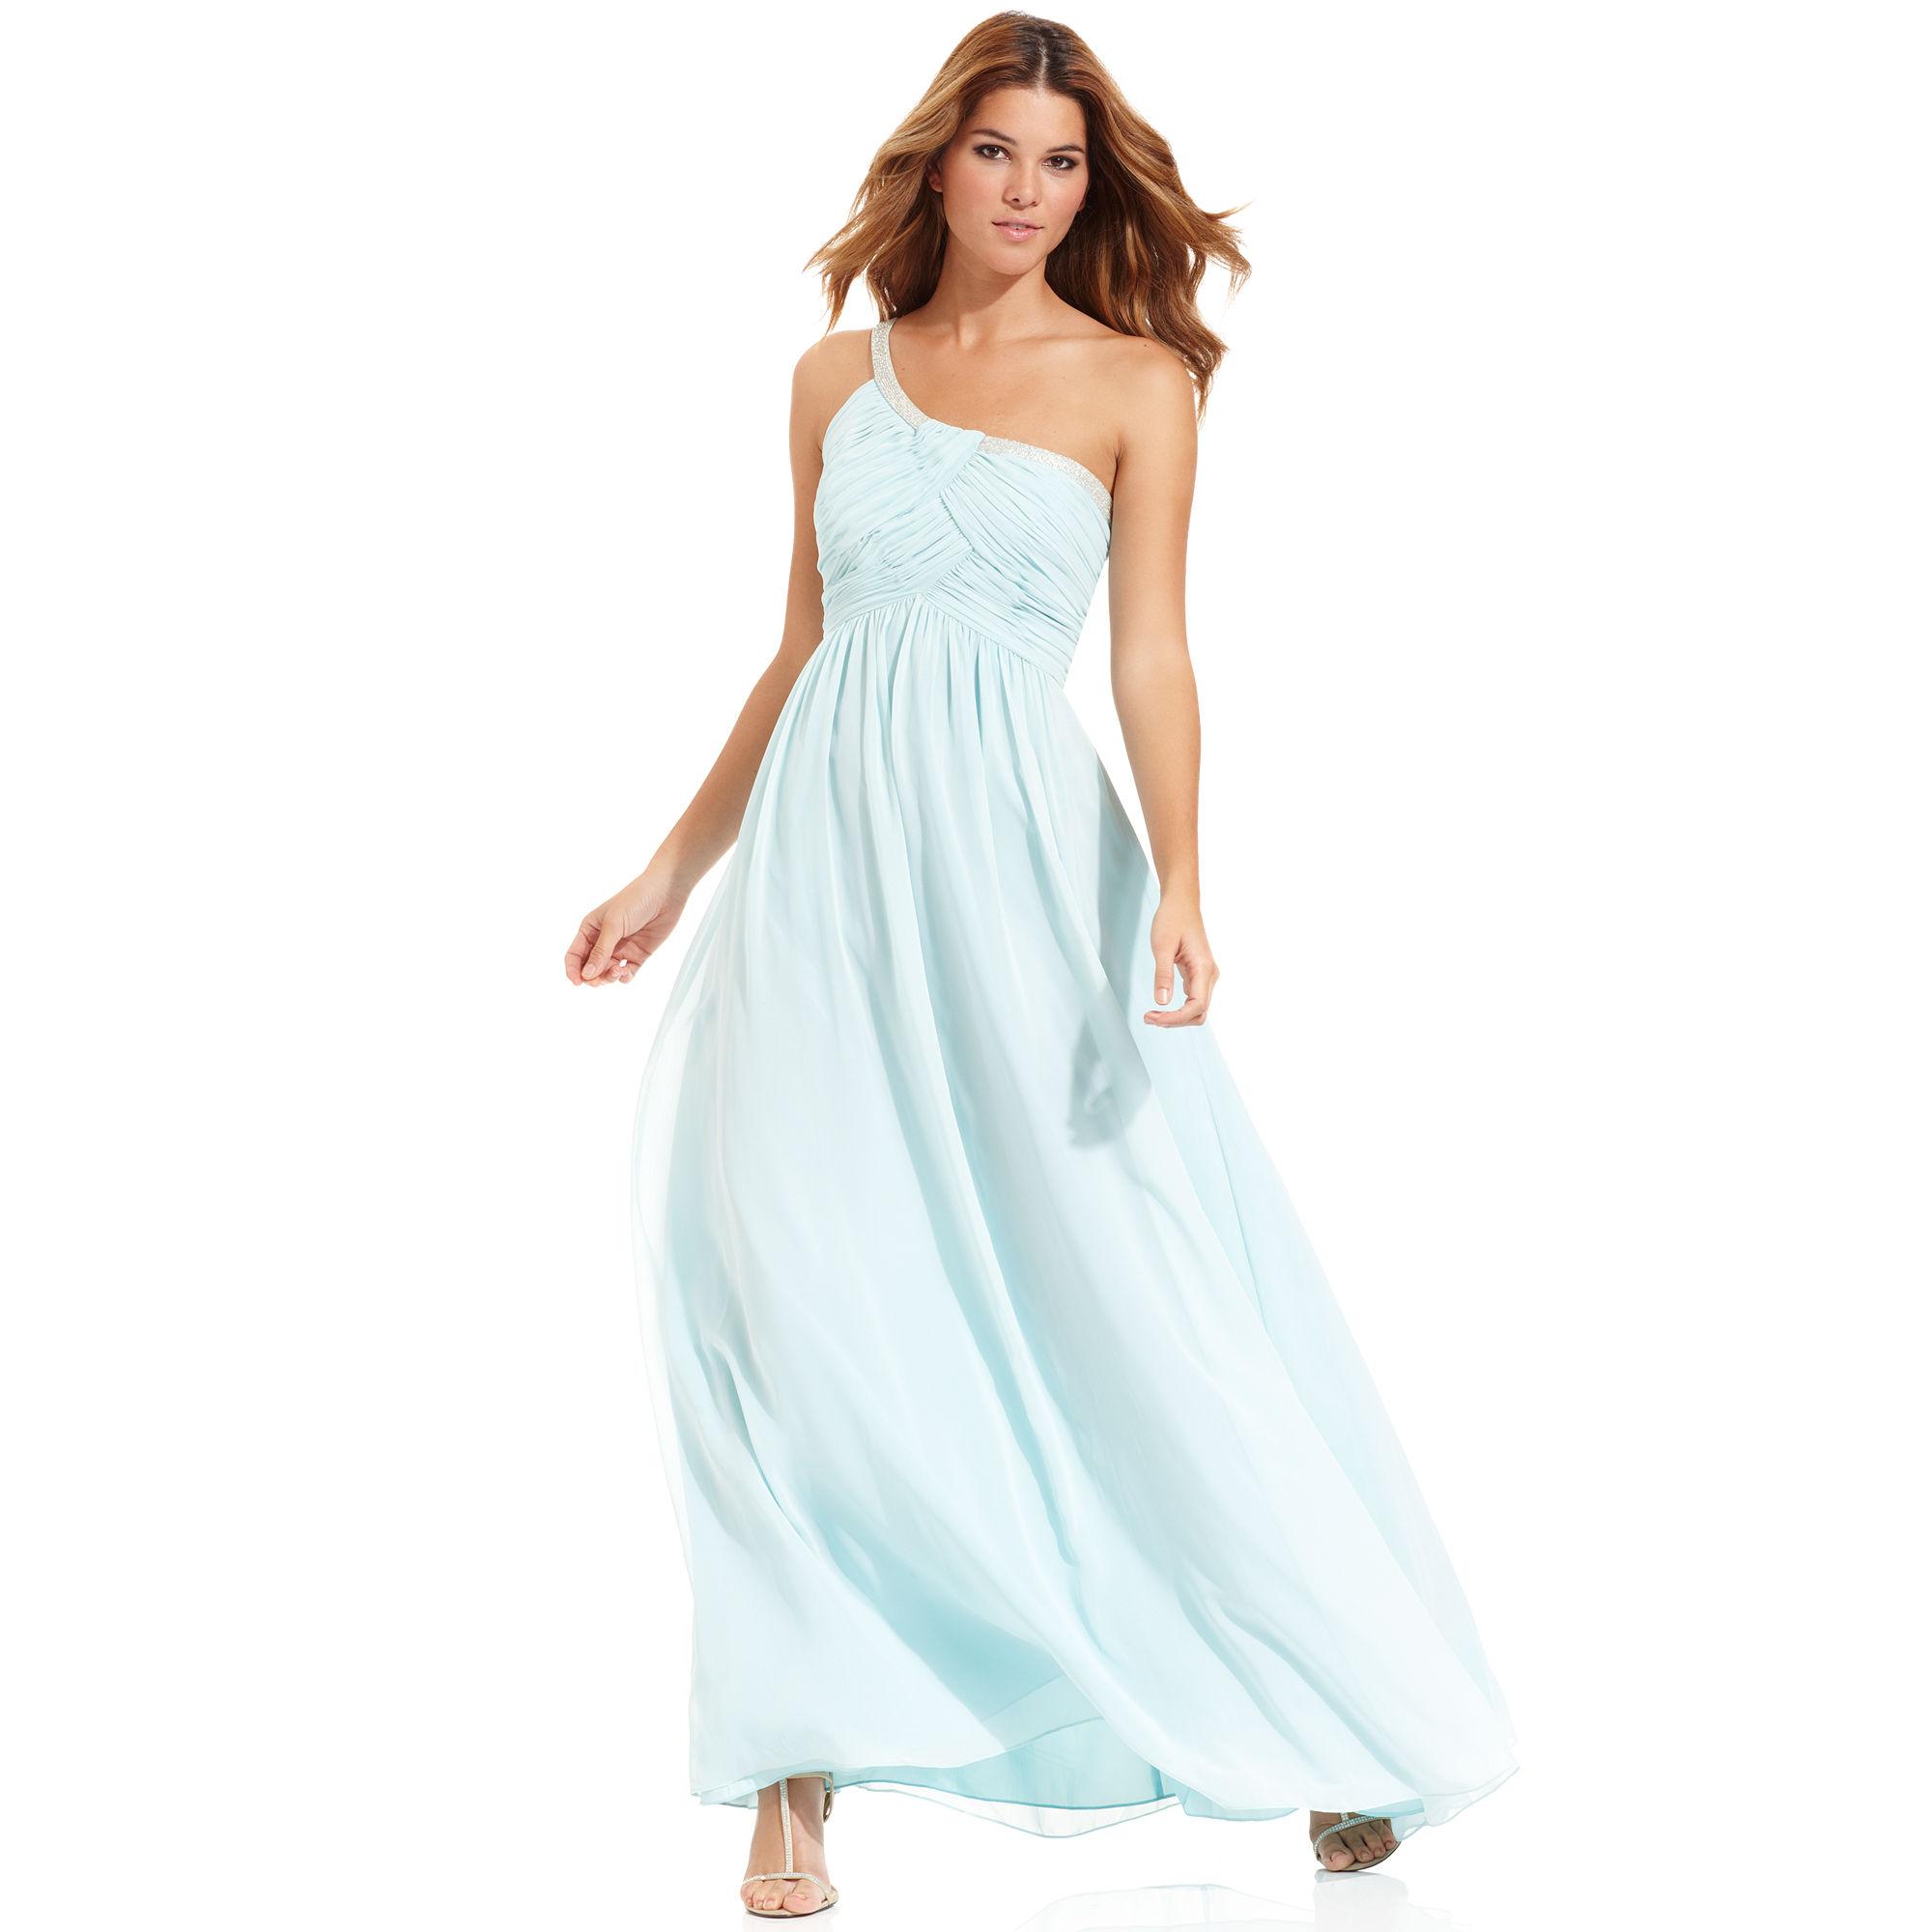 prom dresses on sale at macy macy's wedding dresses Prom Dresses On Sale At Macy 58